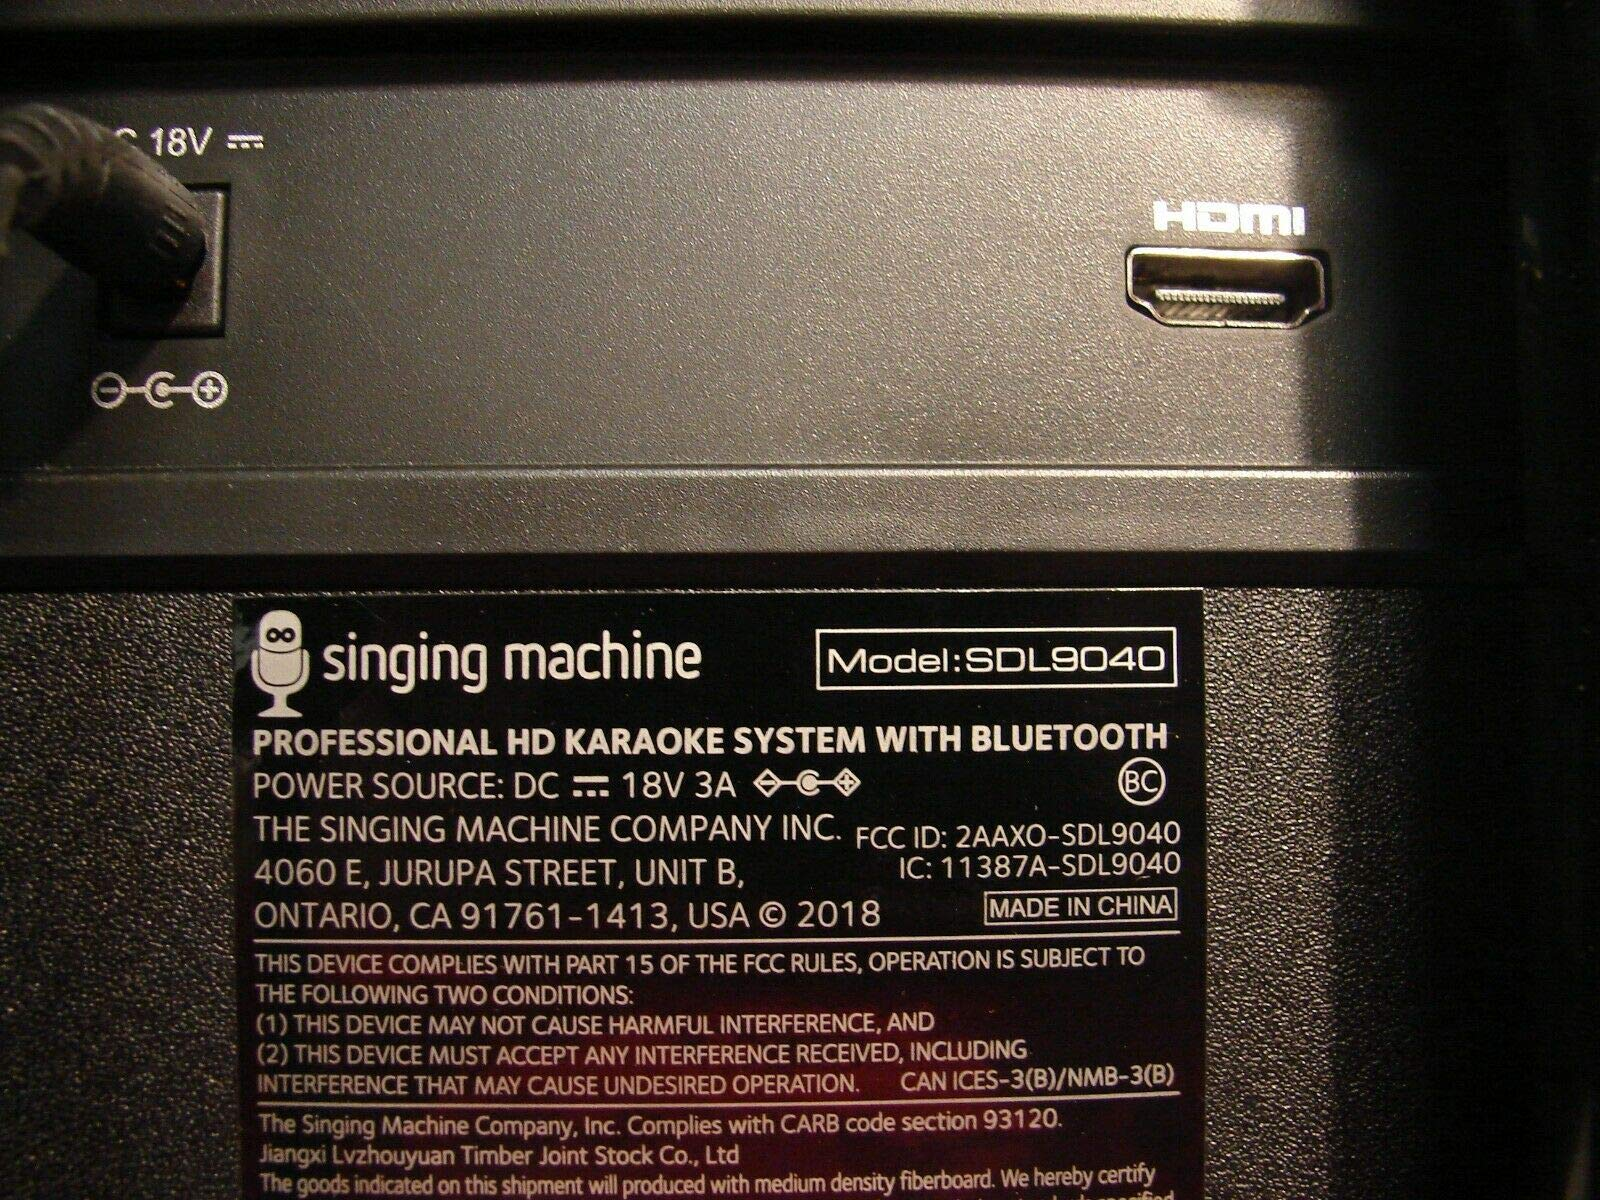 Amoldar 5inging Machine Fiest@ Voice Hi-Definition Karaoke System SDL9040 by Amoldar (Image #5)